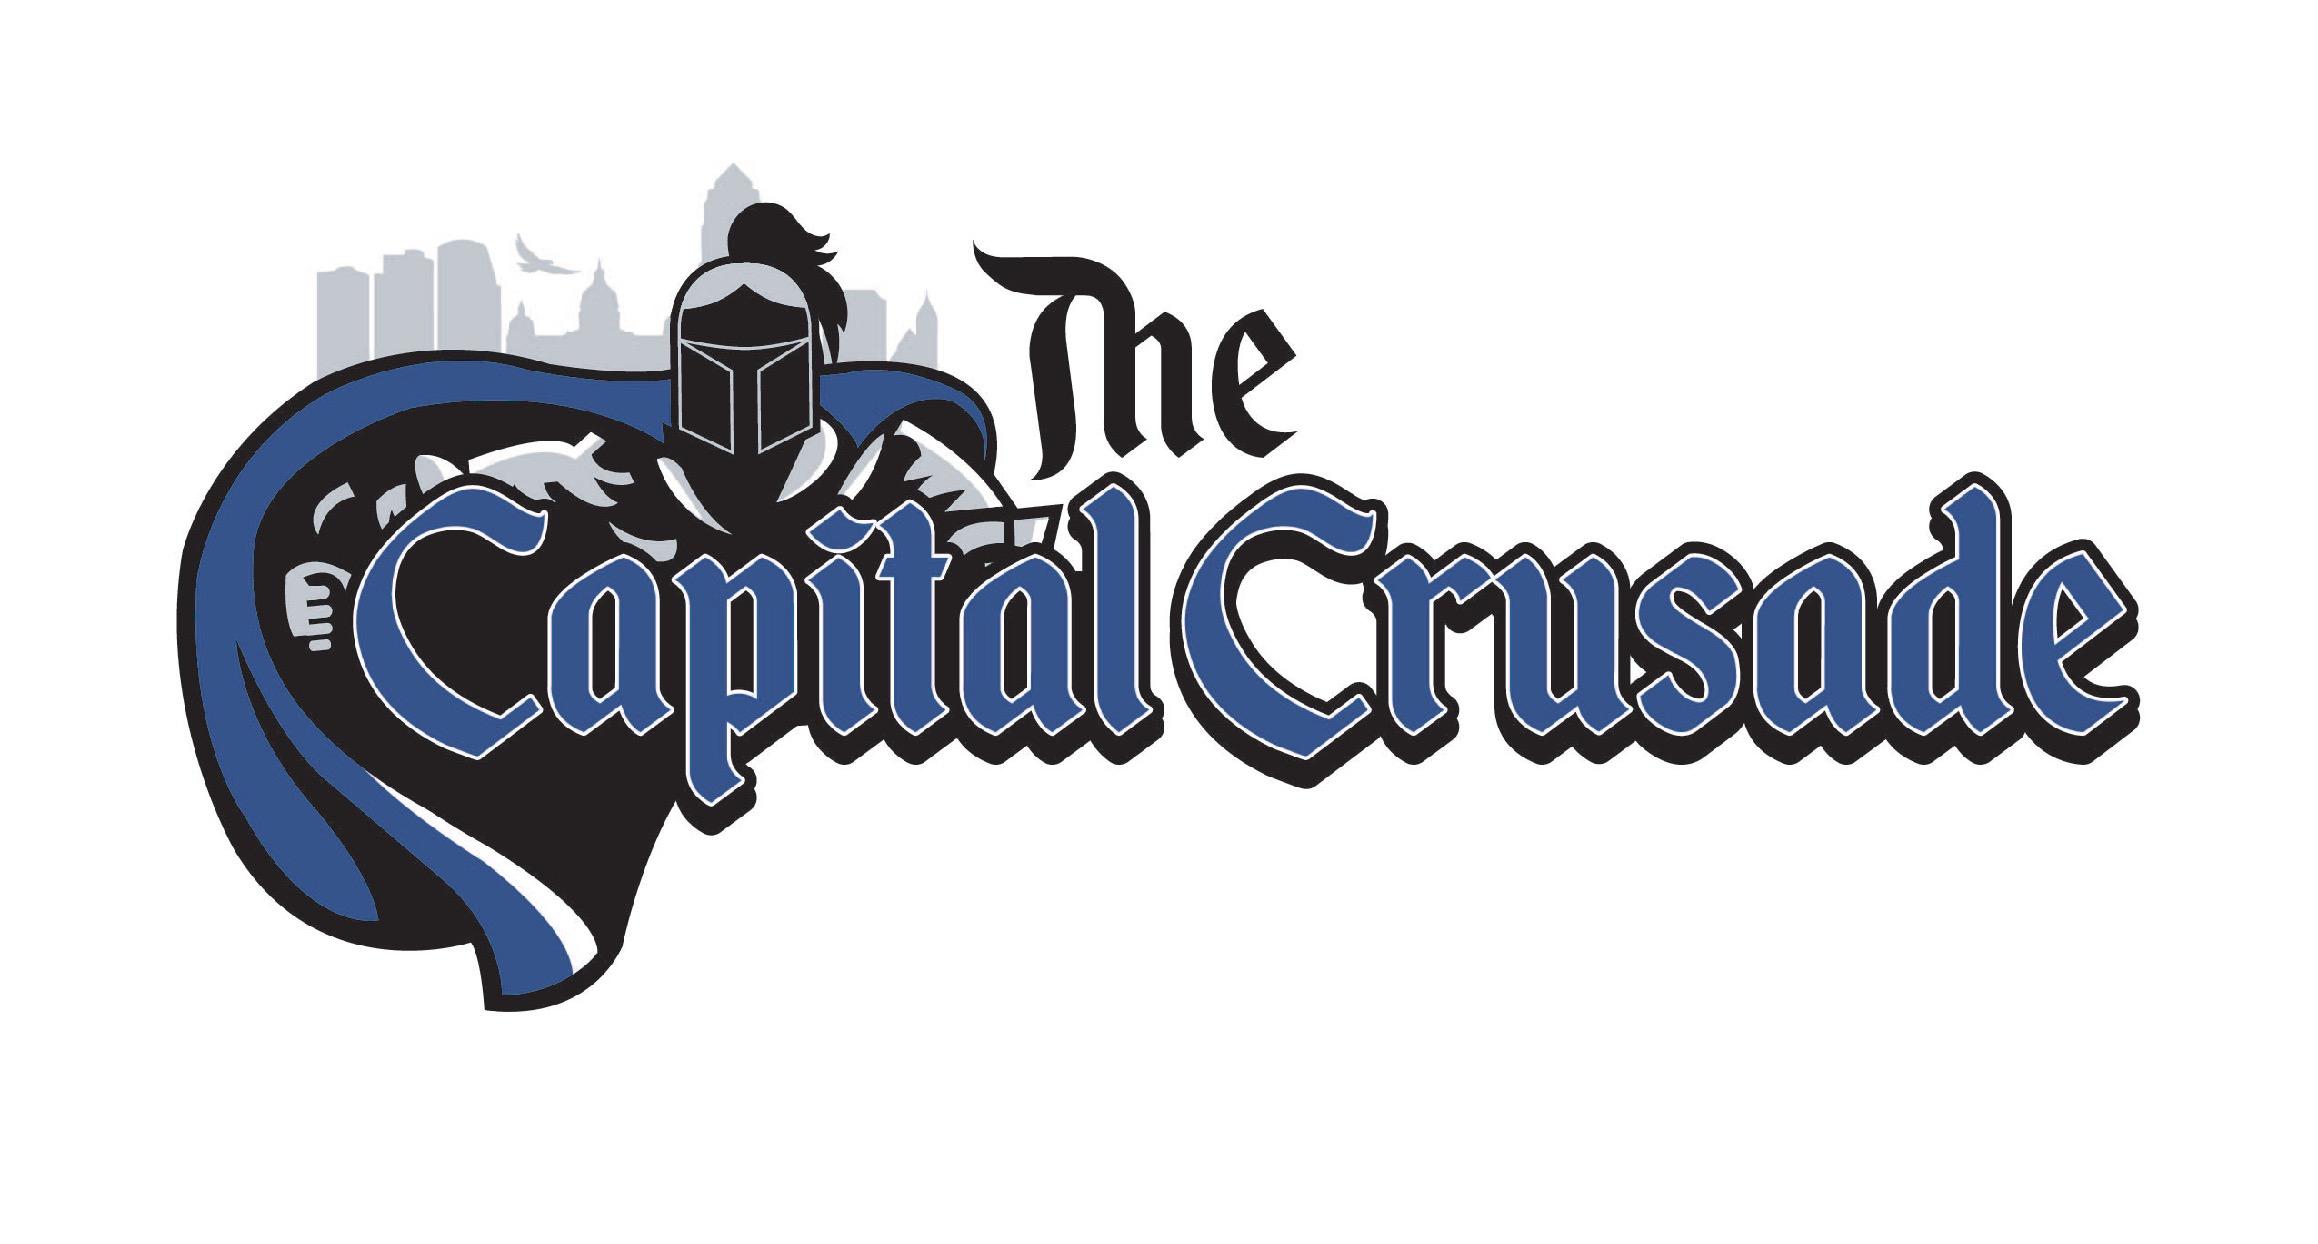 Capital Crusade Logo